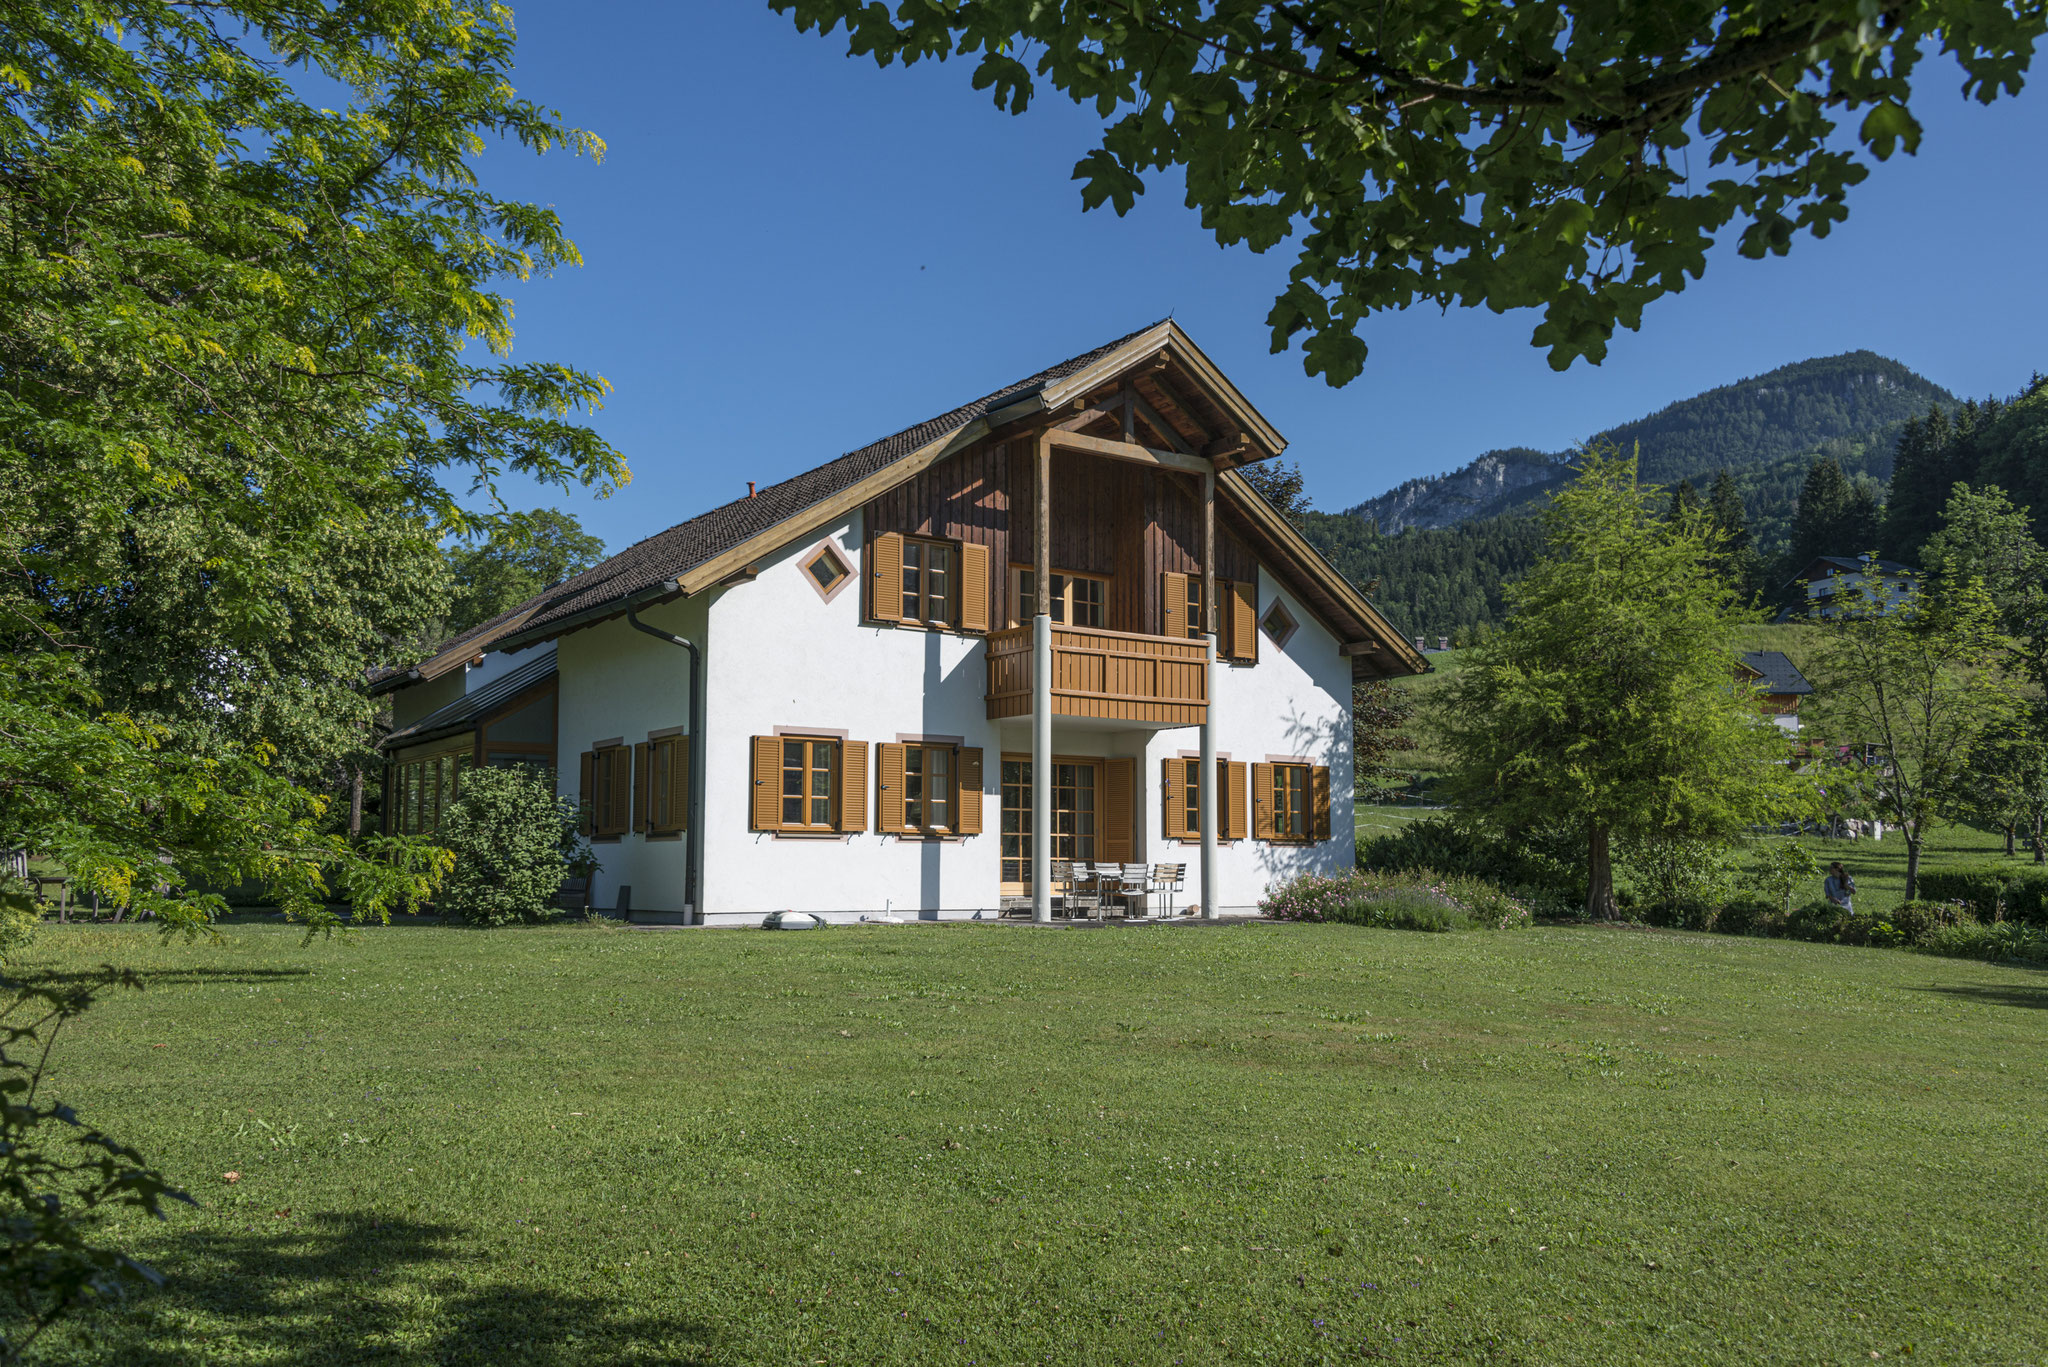 Ferienhaus Salzkammergut, Villa Anna Bad Goisern